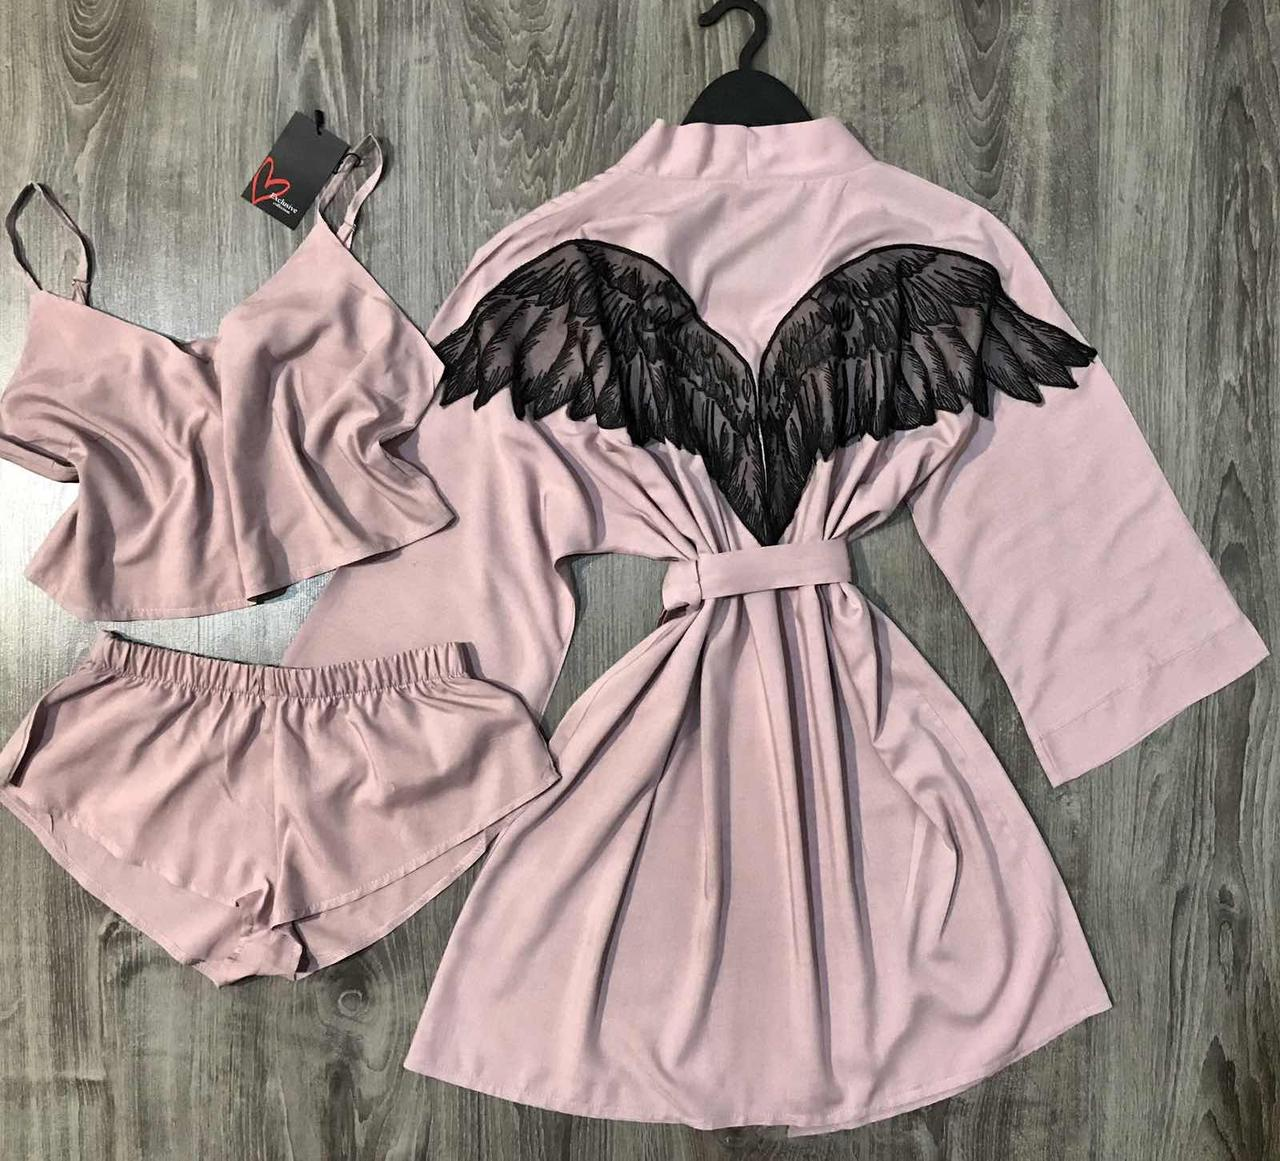 Халат с крыльями, комплект тройка халат+ топ+шорты